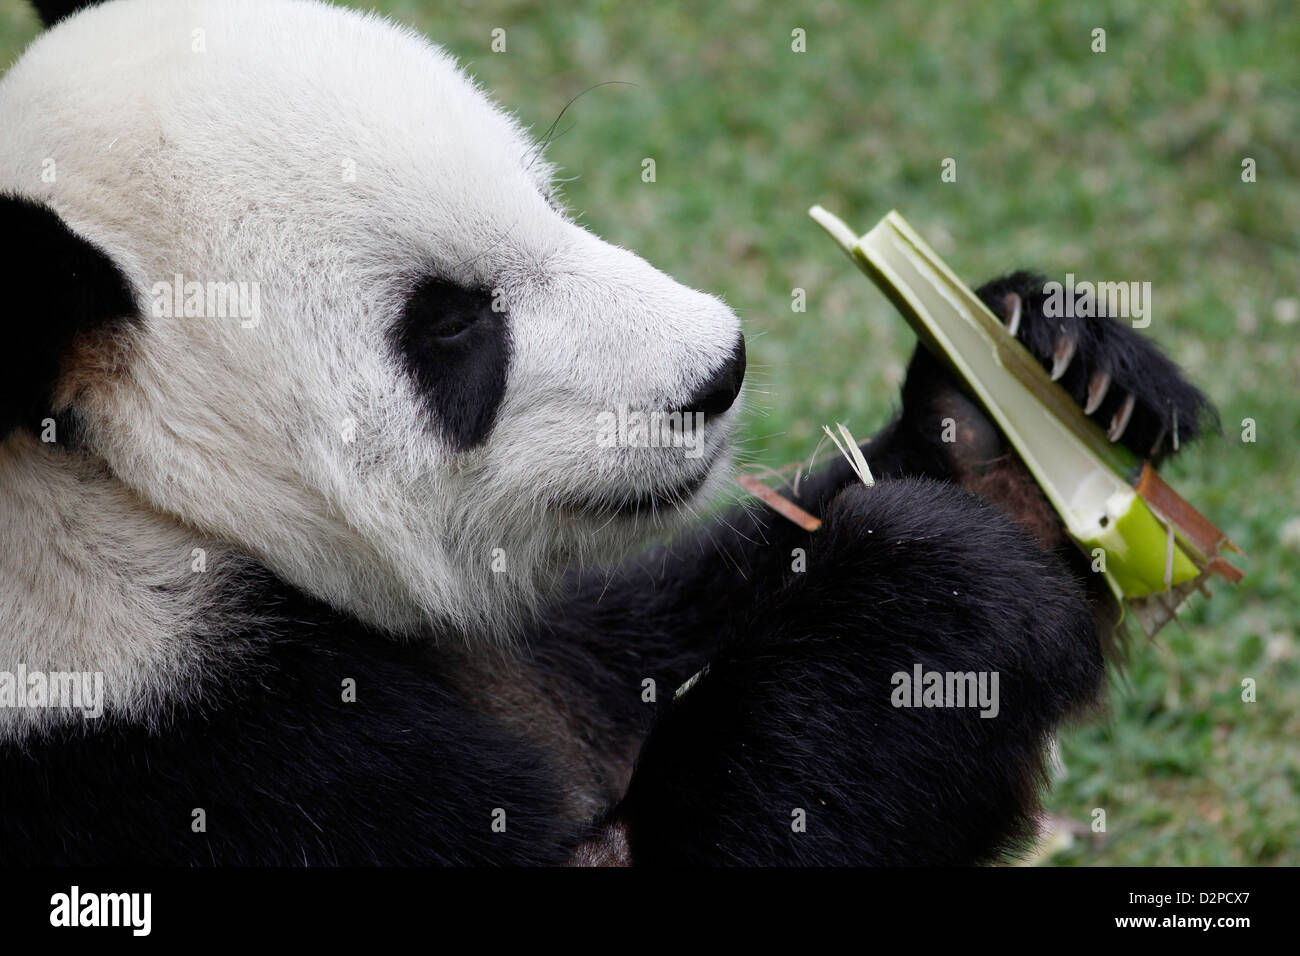 Giant Panda eating bamboo Memphis Zoo Tennessee - Stock Image